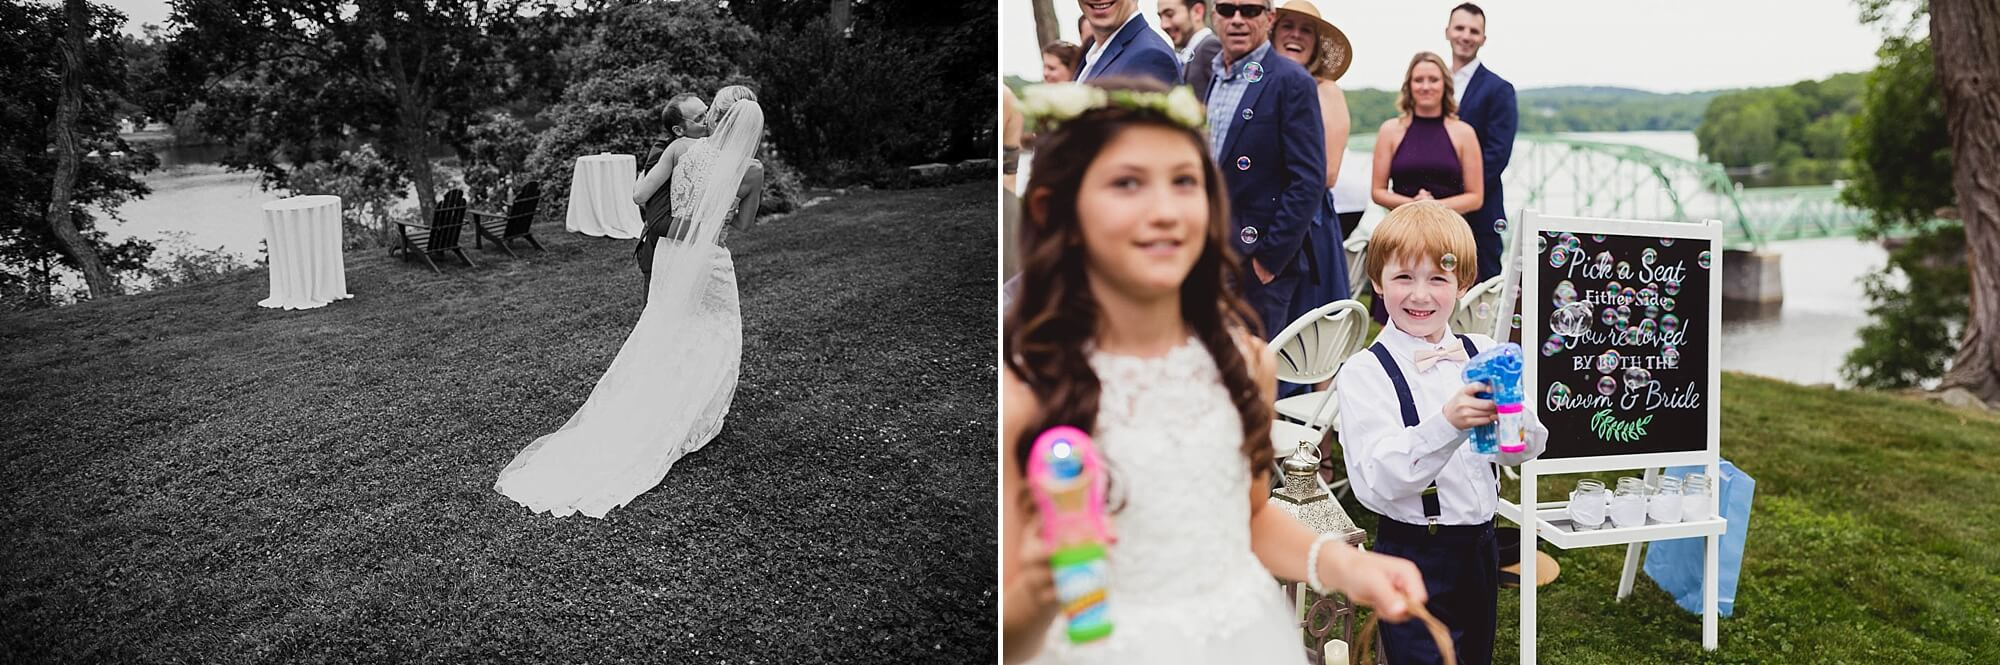 Backyard Wedding - MA_0045.jpg